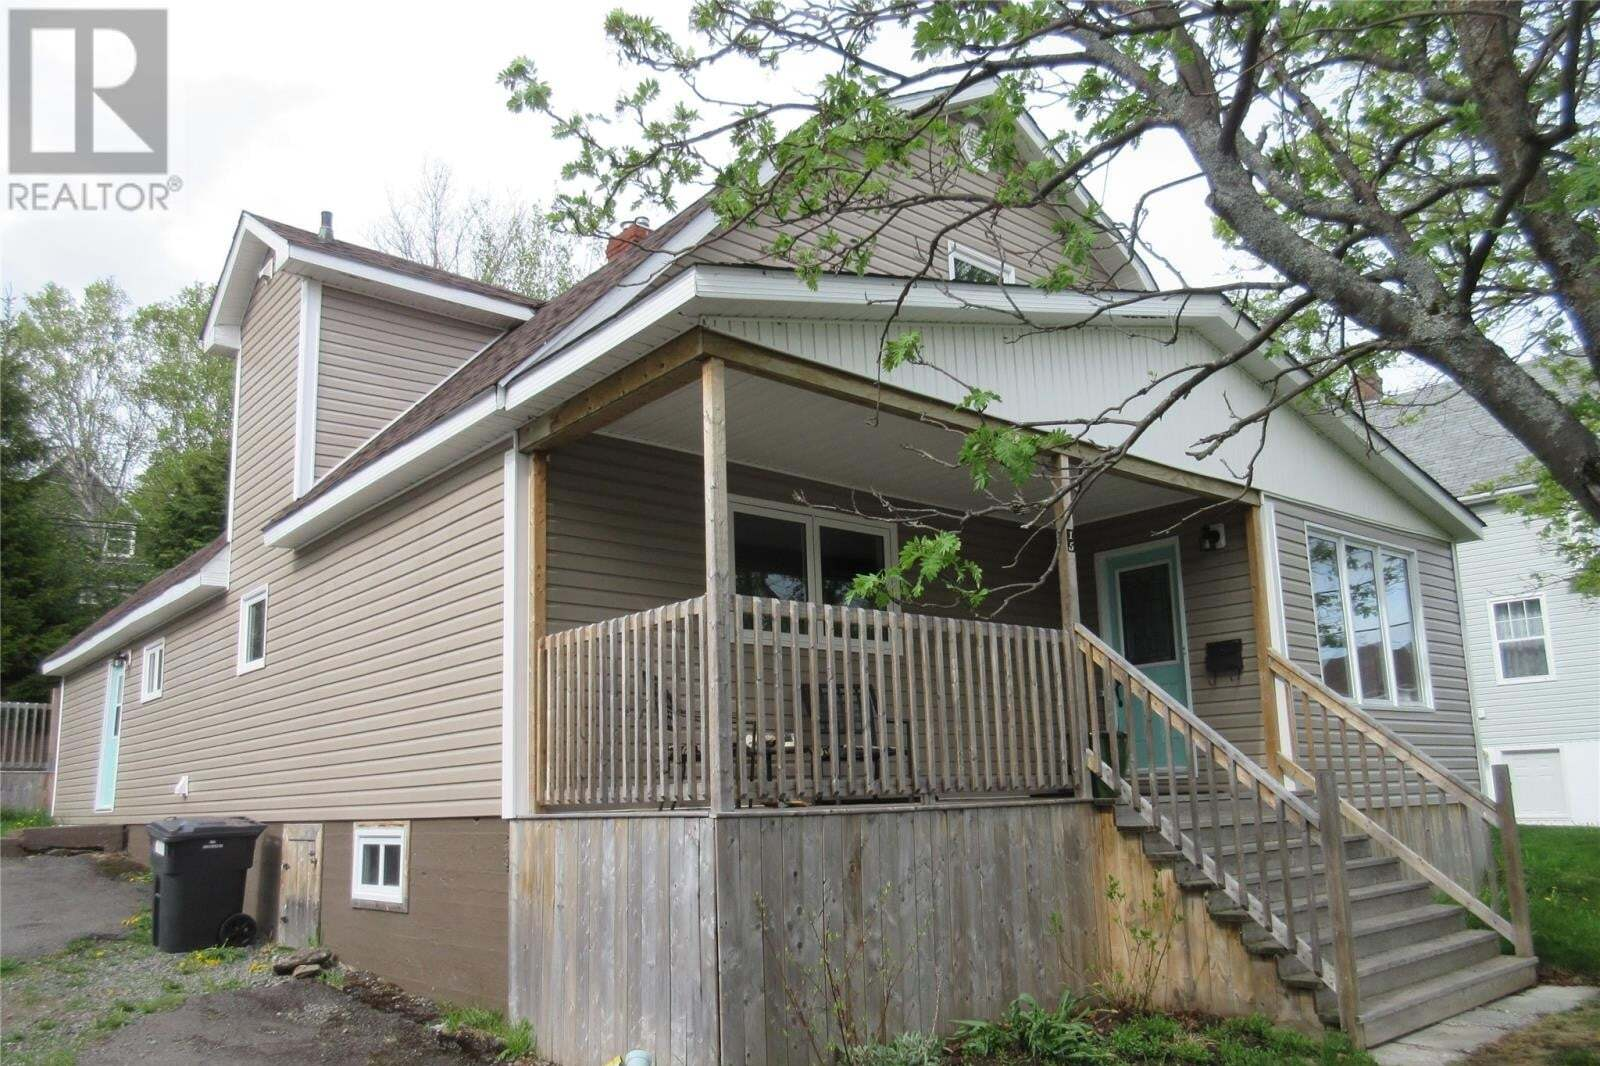 House for sale at 15 Junction Rd Grand Falls-windsor Newfoundland - MLS: 1214627